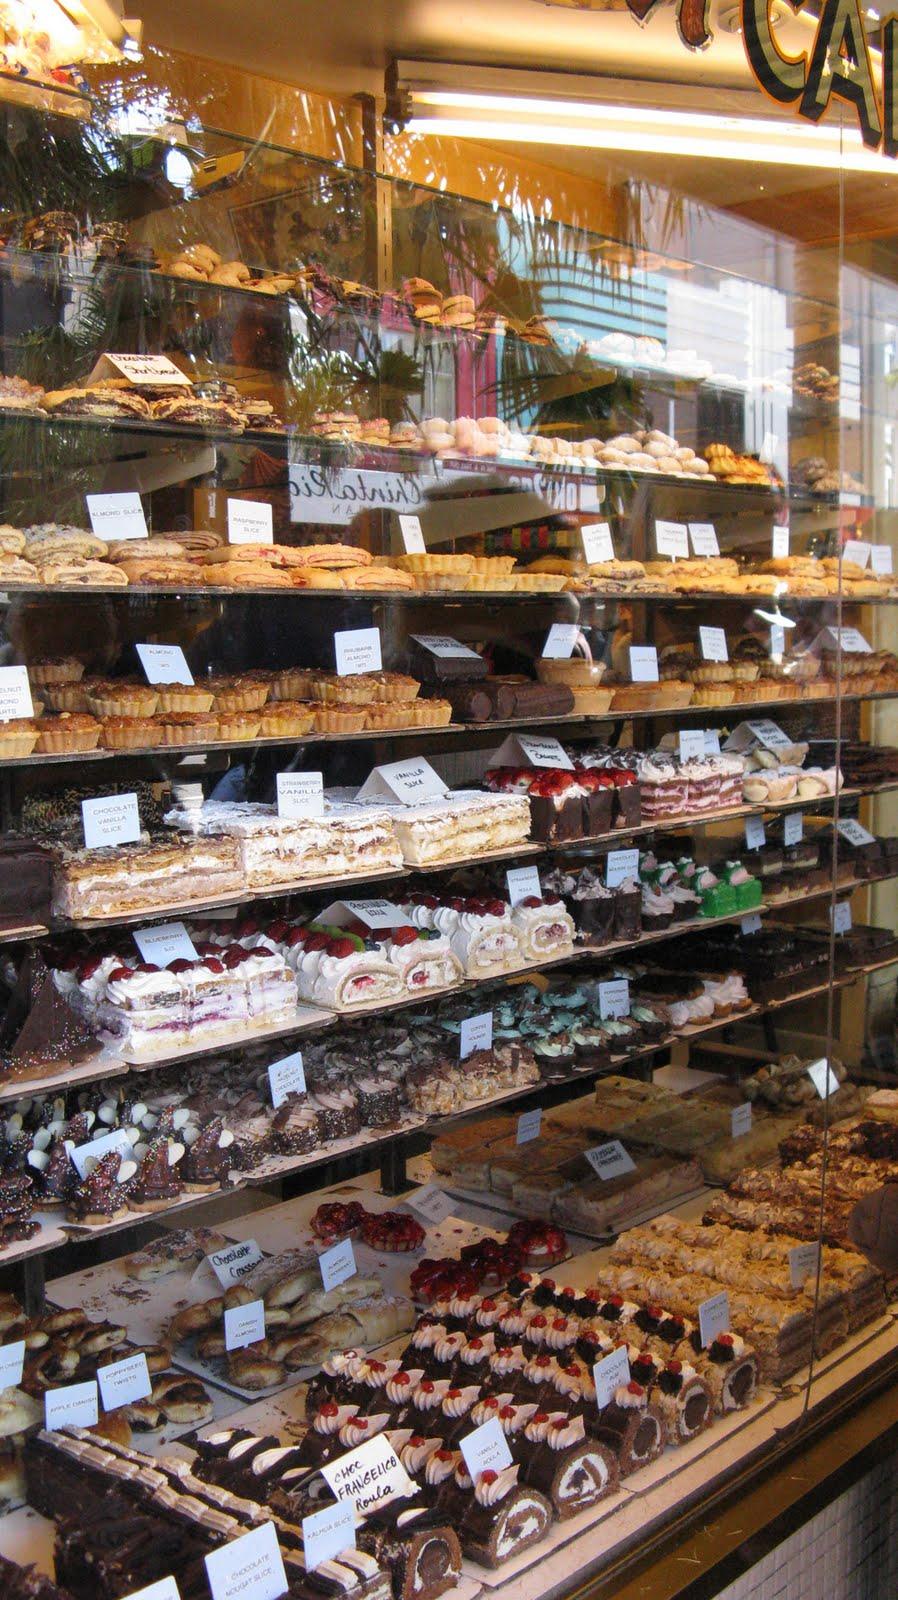 [St.+Kilda+bakery]